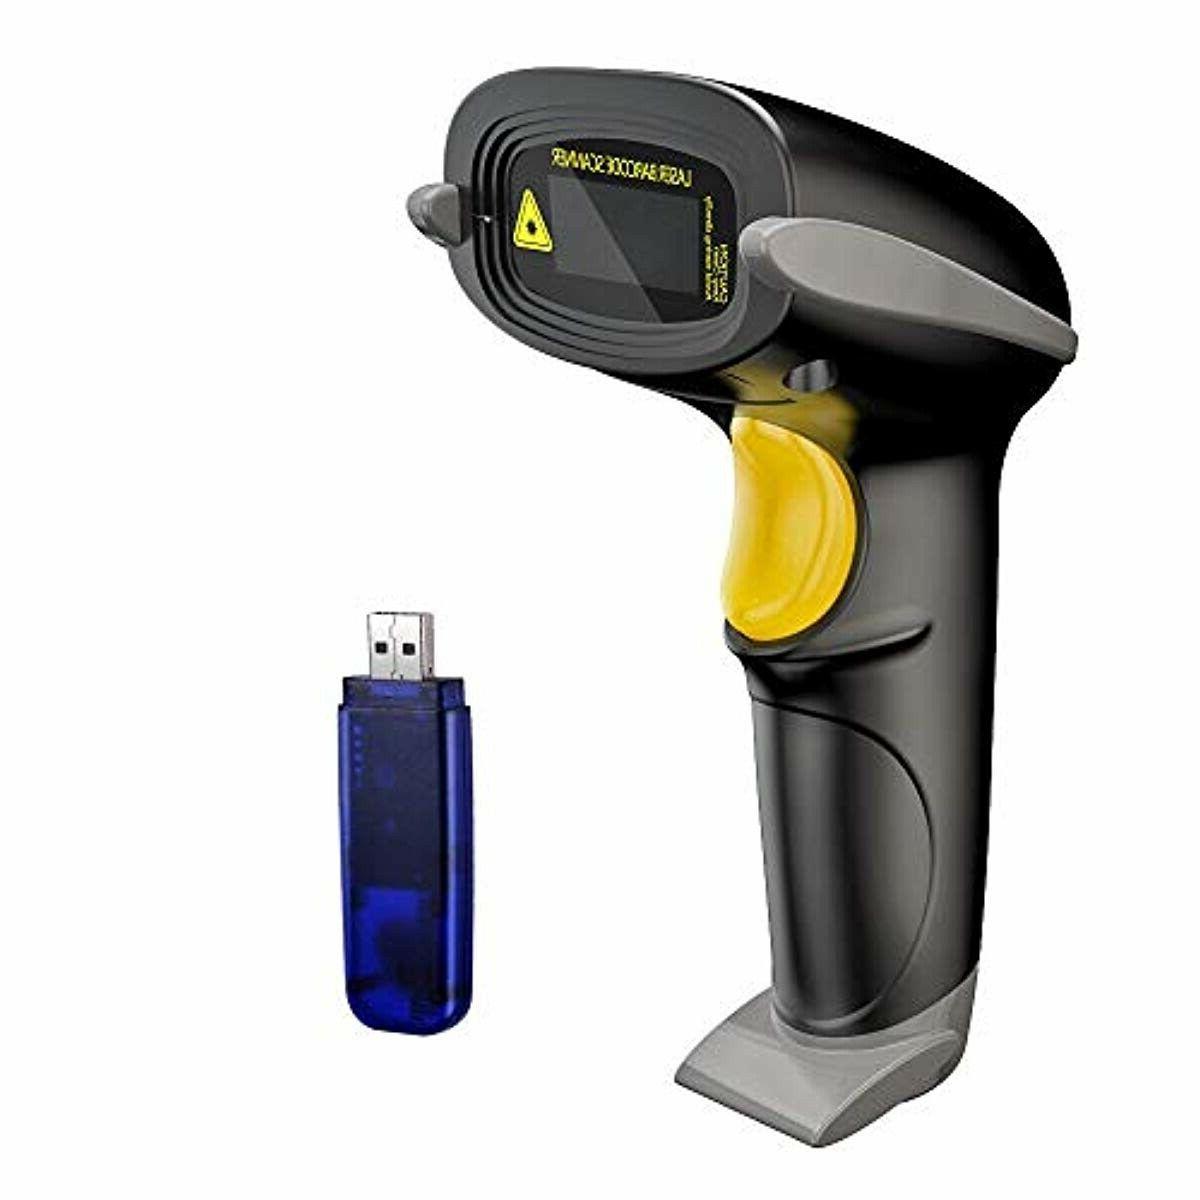 wireless barcode scanner 328 feet transmission distance